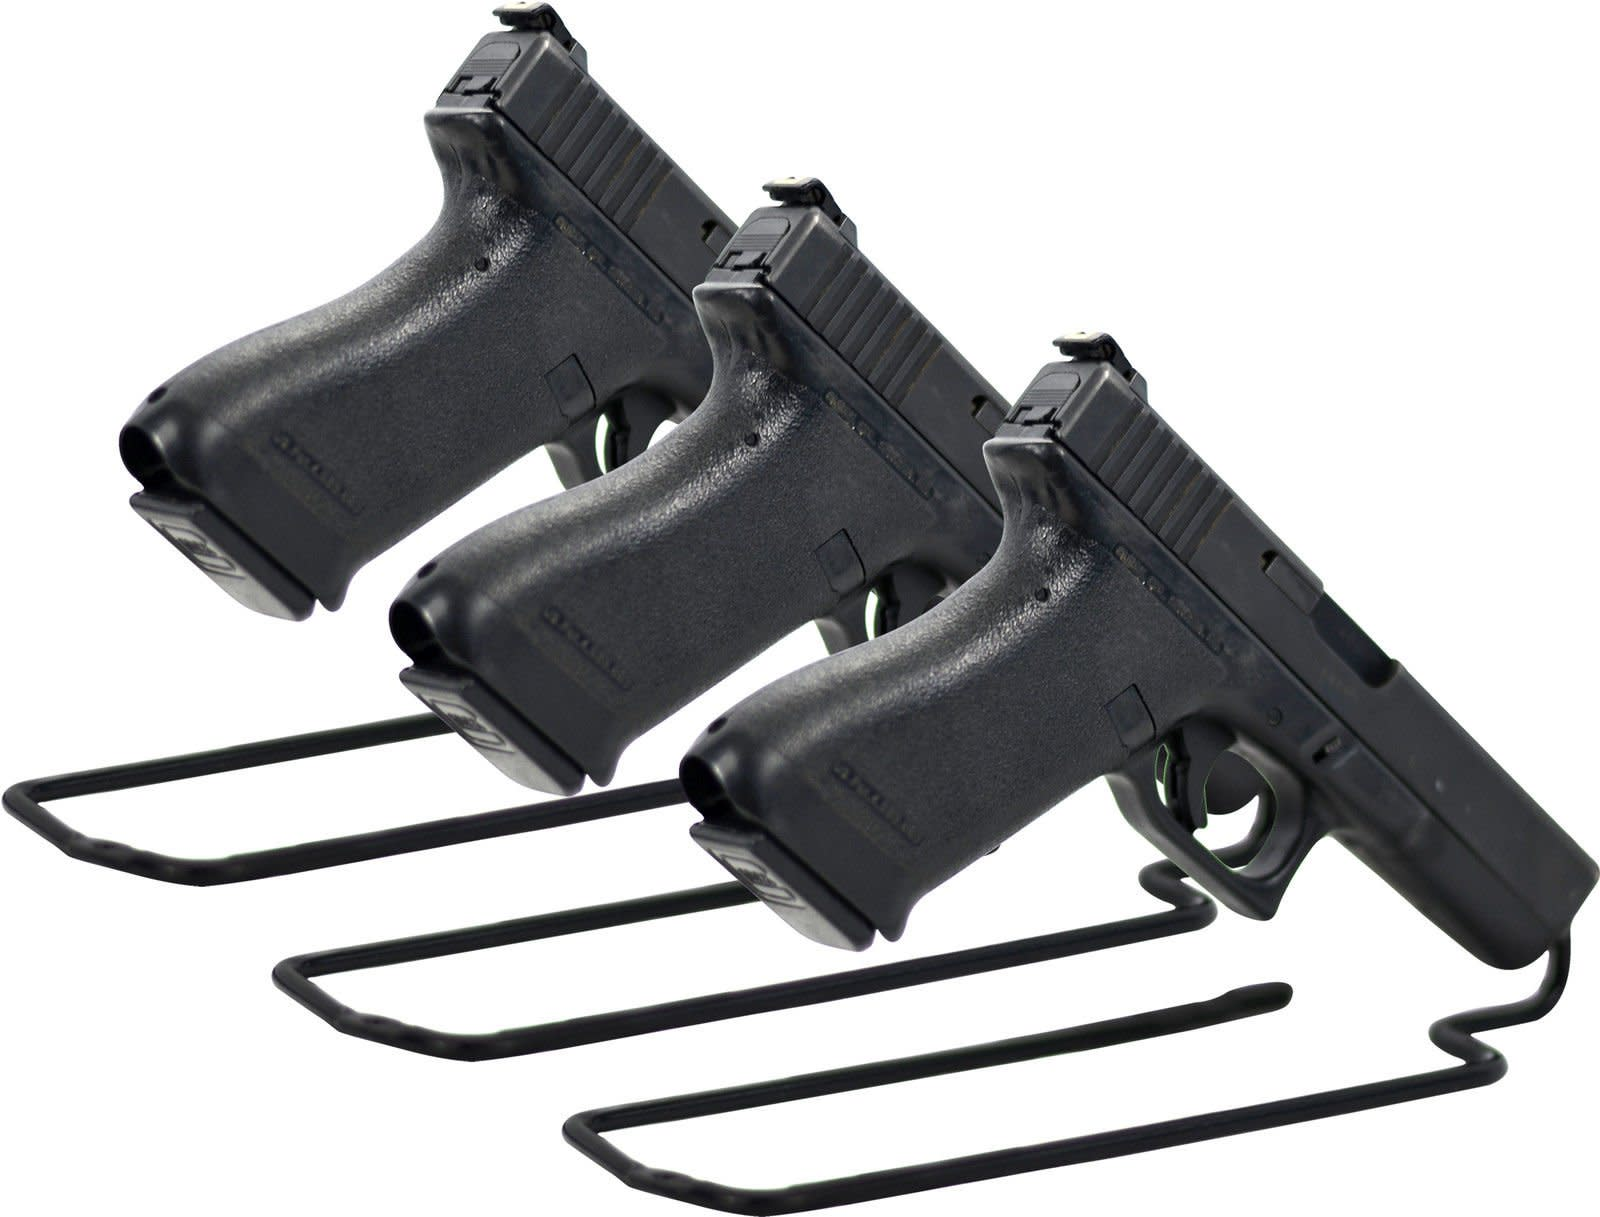 display stand pistol